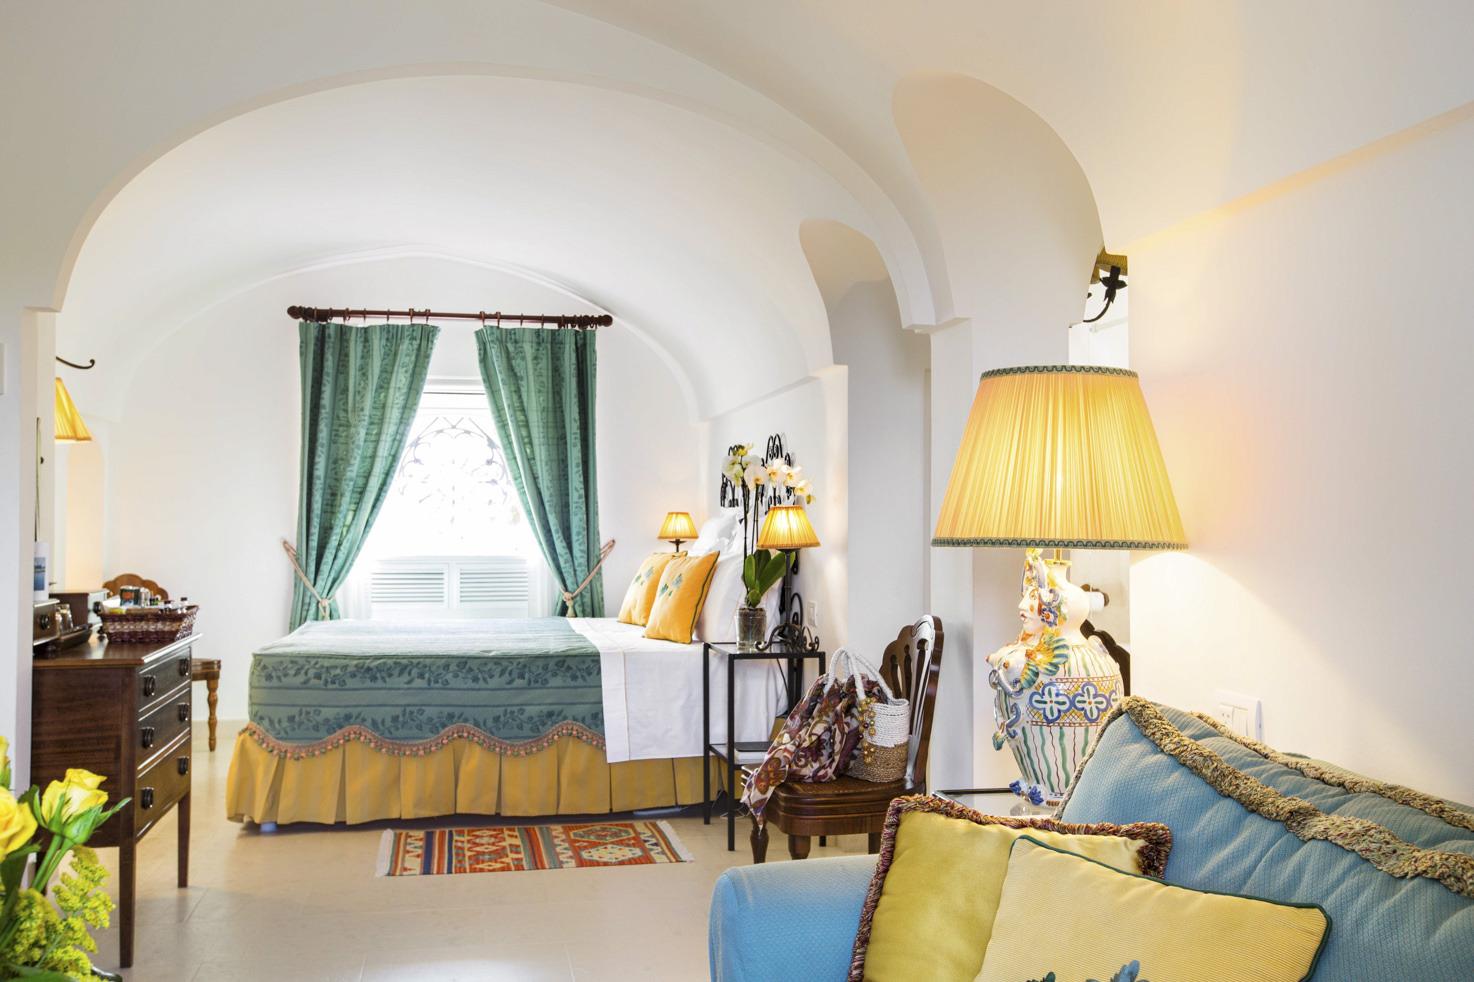 Accommodation at Masseria San Domenico